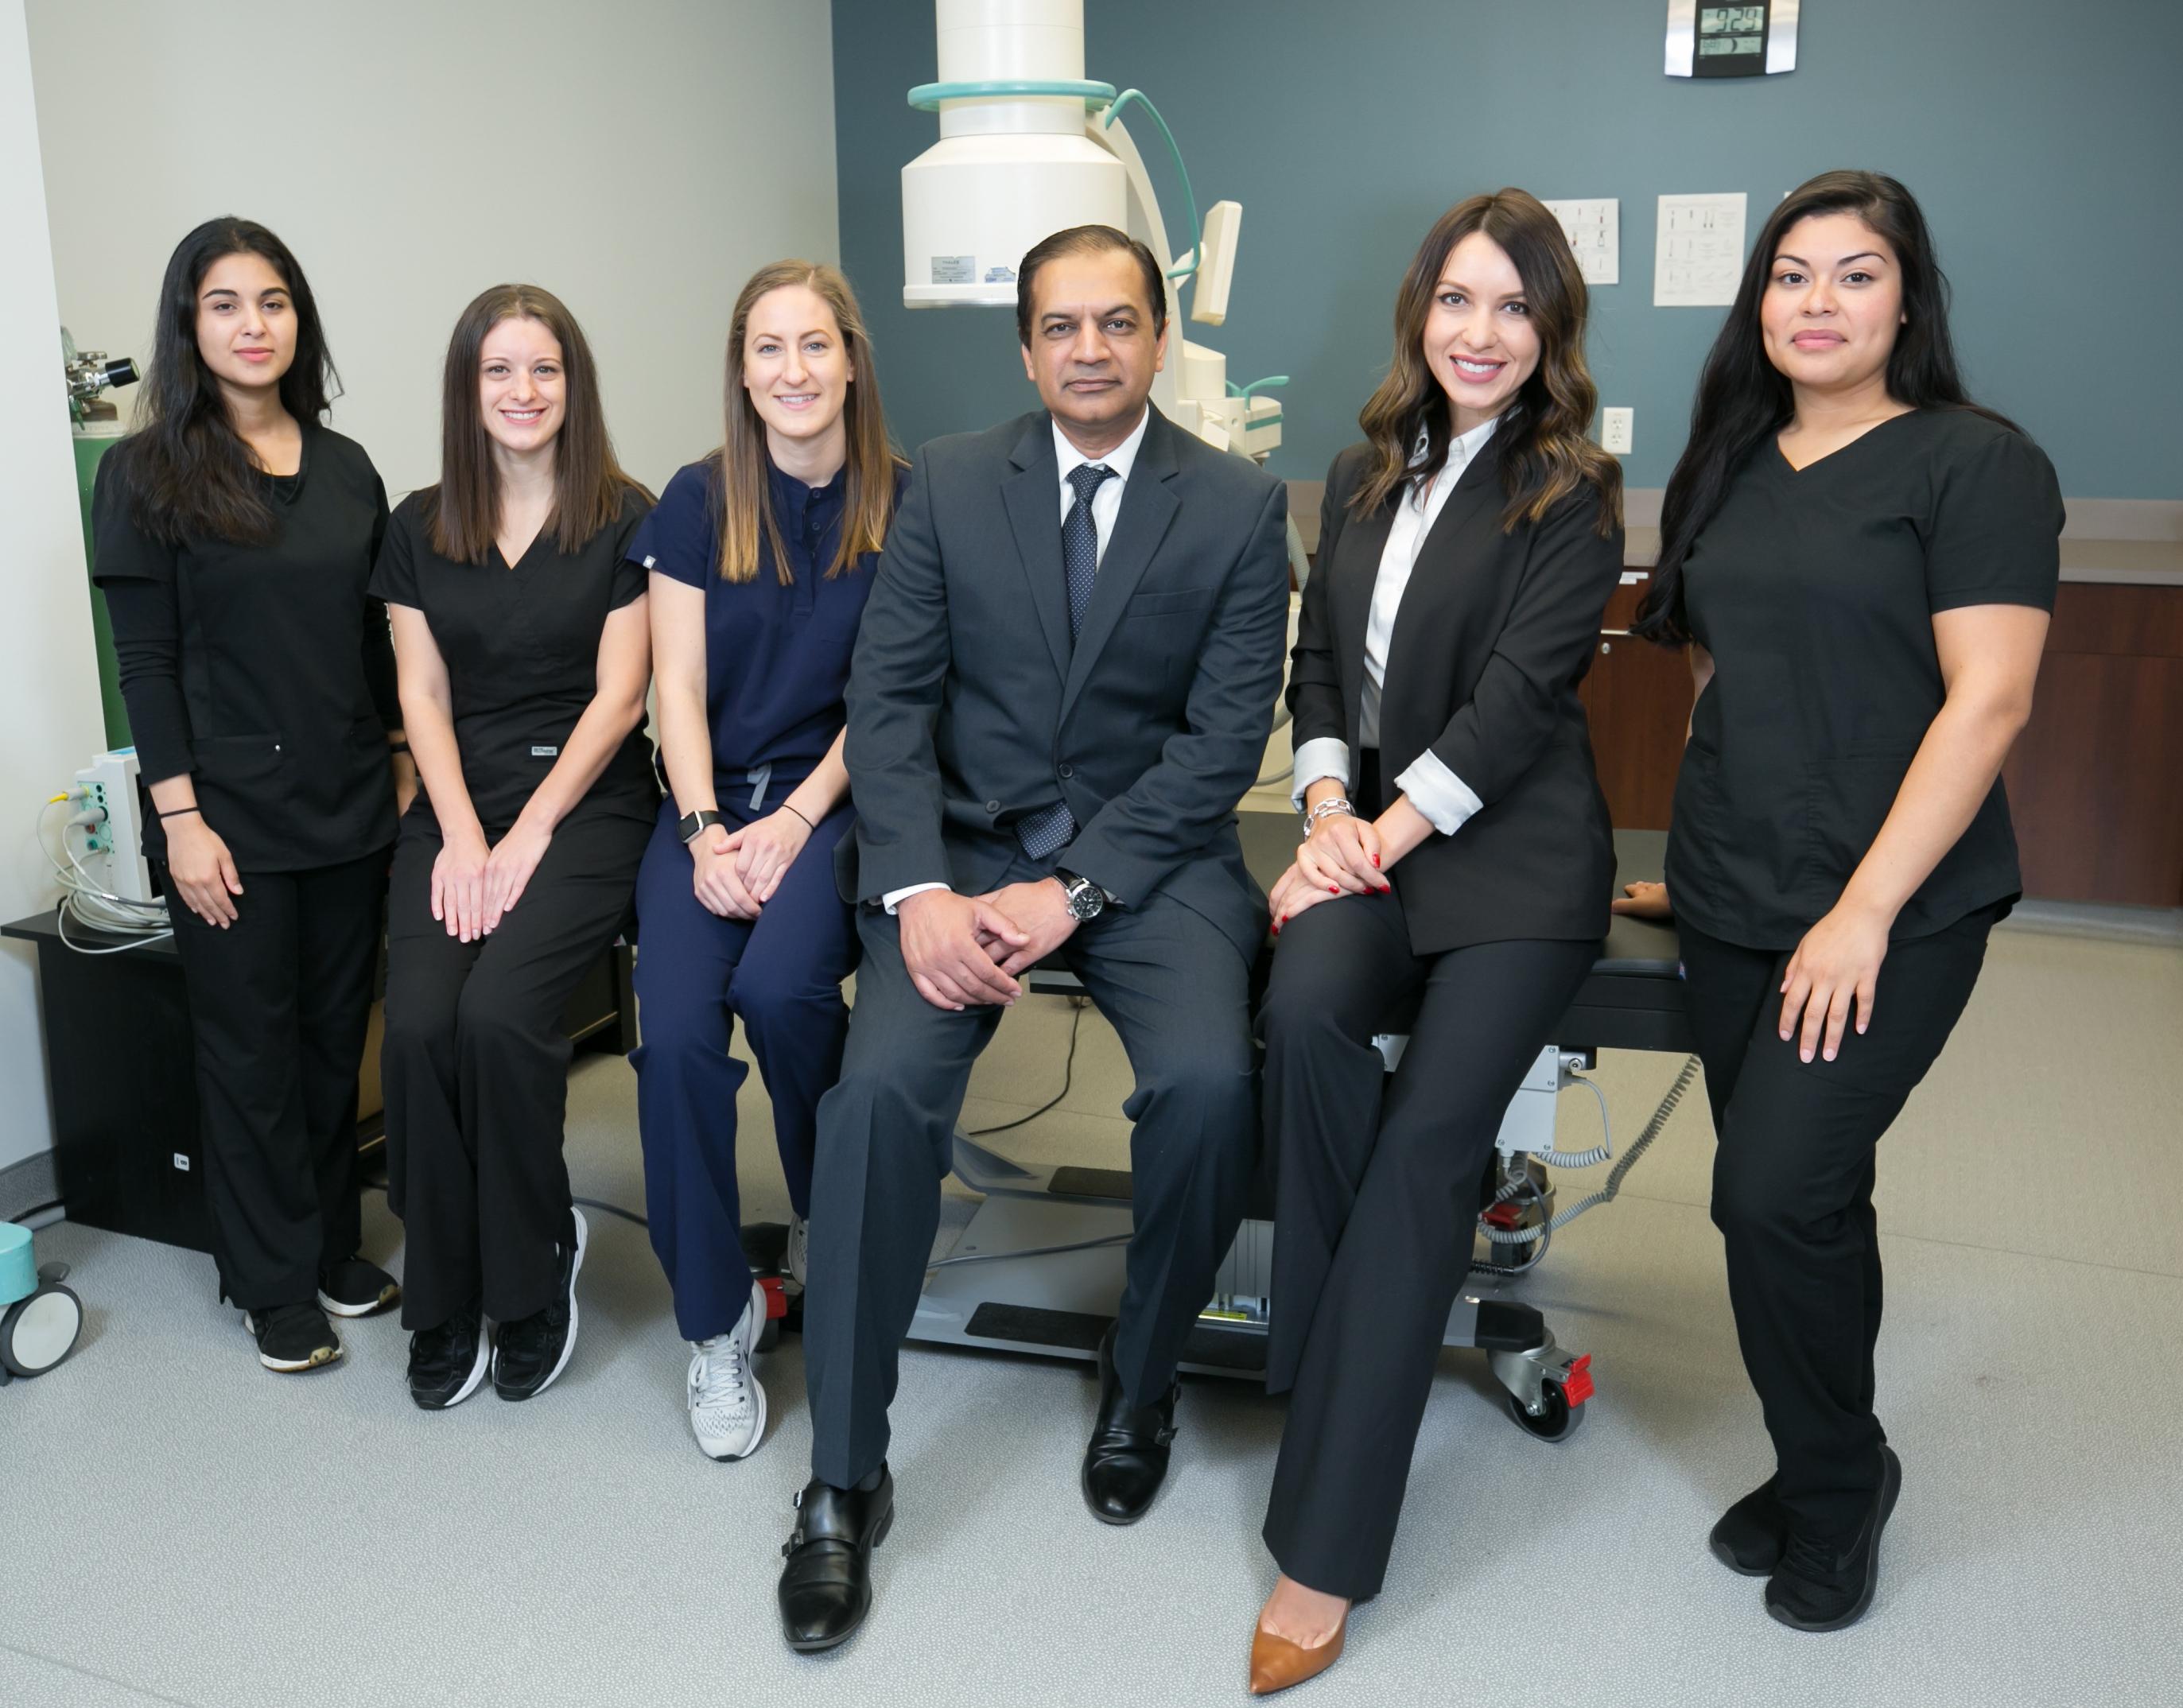 Spine & Pain Clinics of North America reviews | Pain Management at 4001 Fair Ridge Dr - Fairfax VA